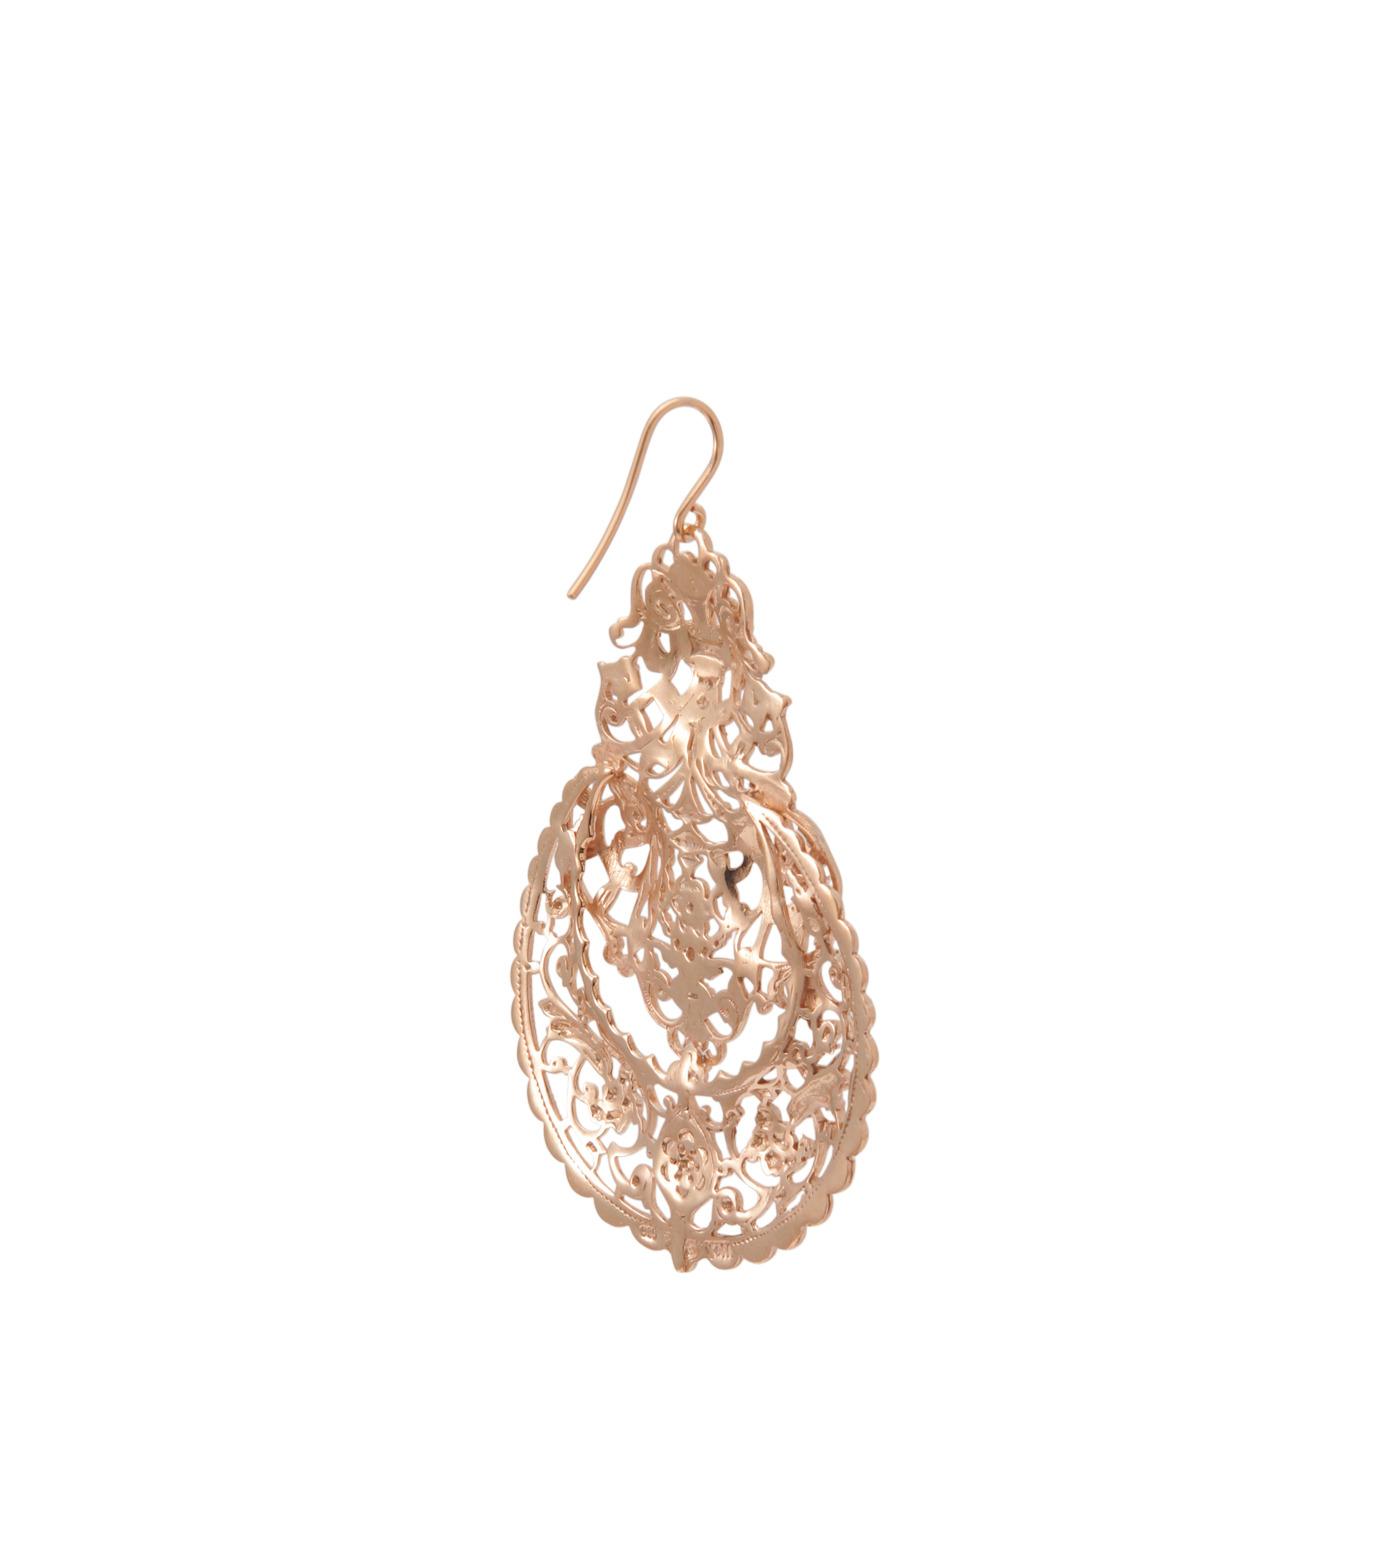 I AM by Ileana Makri(アイ アム バイ イリーナ マクリ)のAntoinette Earrings-ROSE-O489-43-099-75 拡大詳細画像3